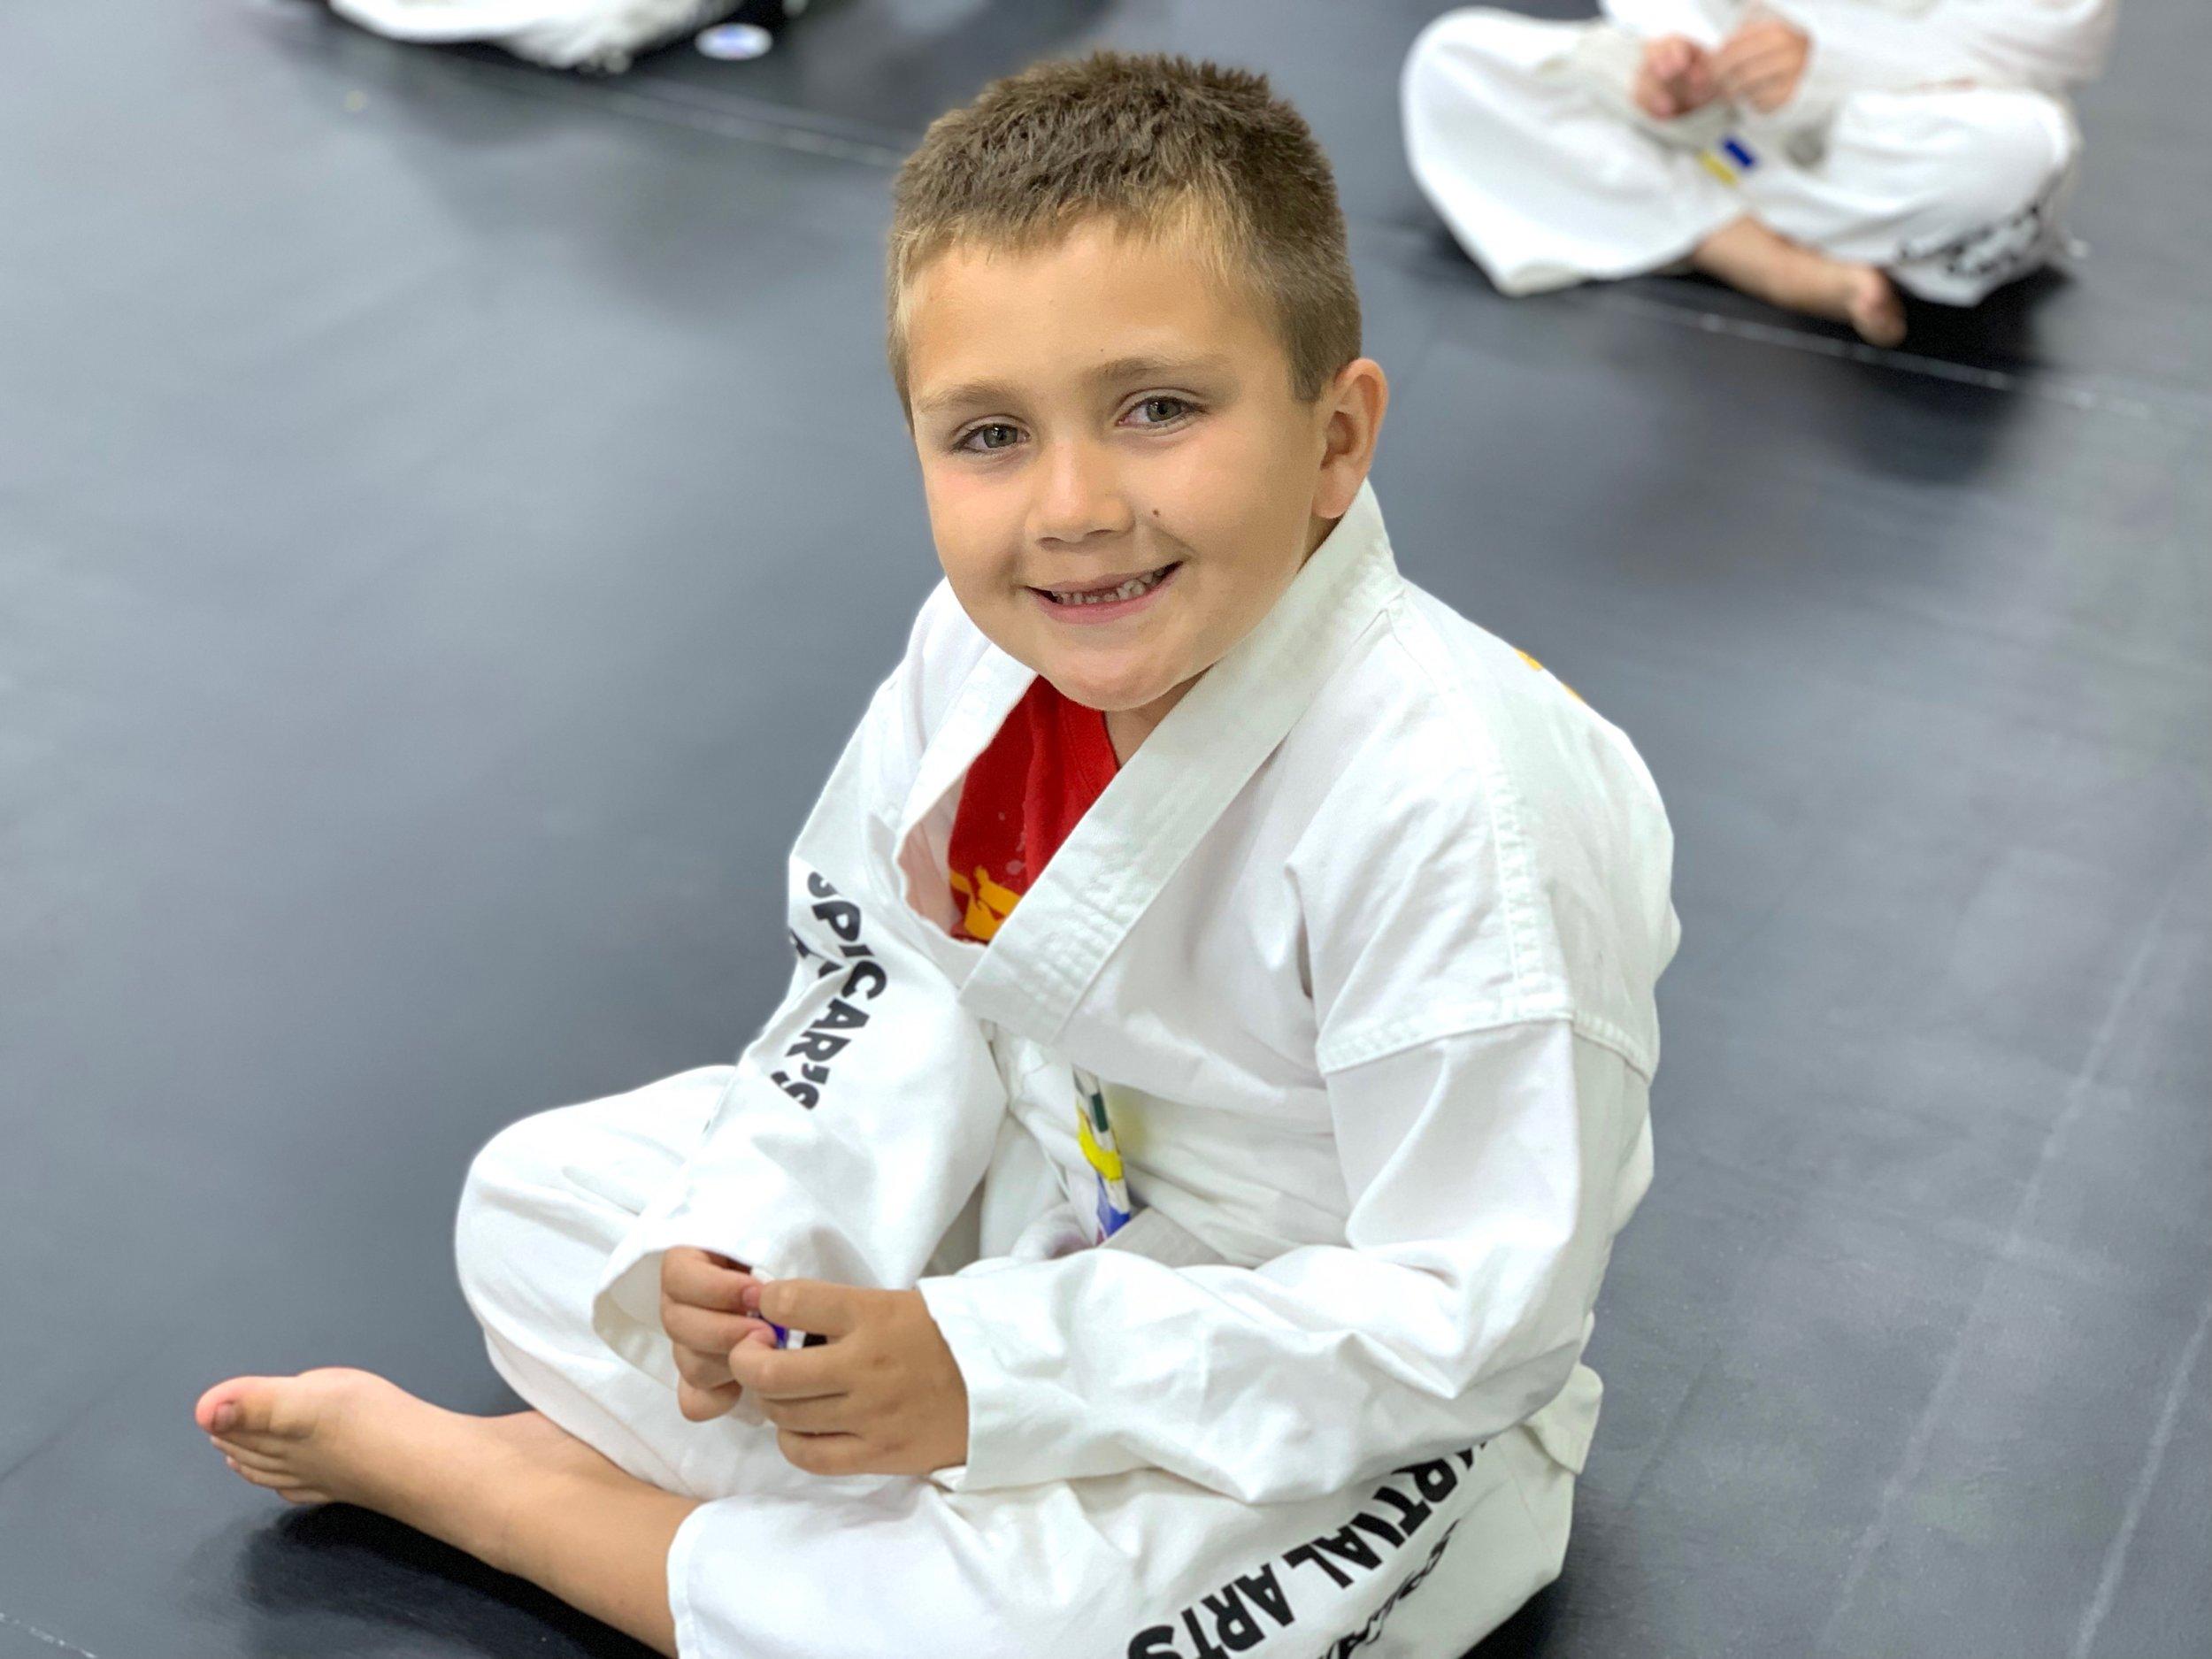 karate-kids-program-souhtlake-keller-grapevine-texas00028.jpeg